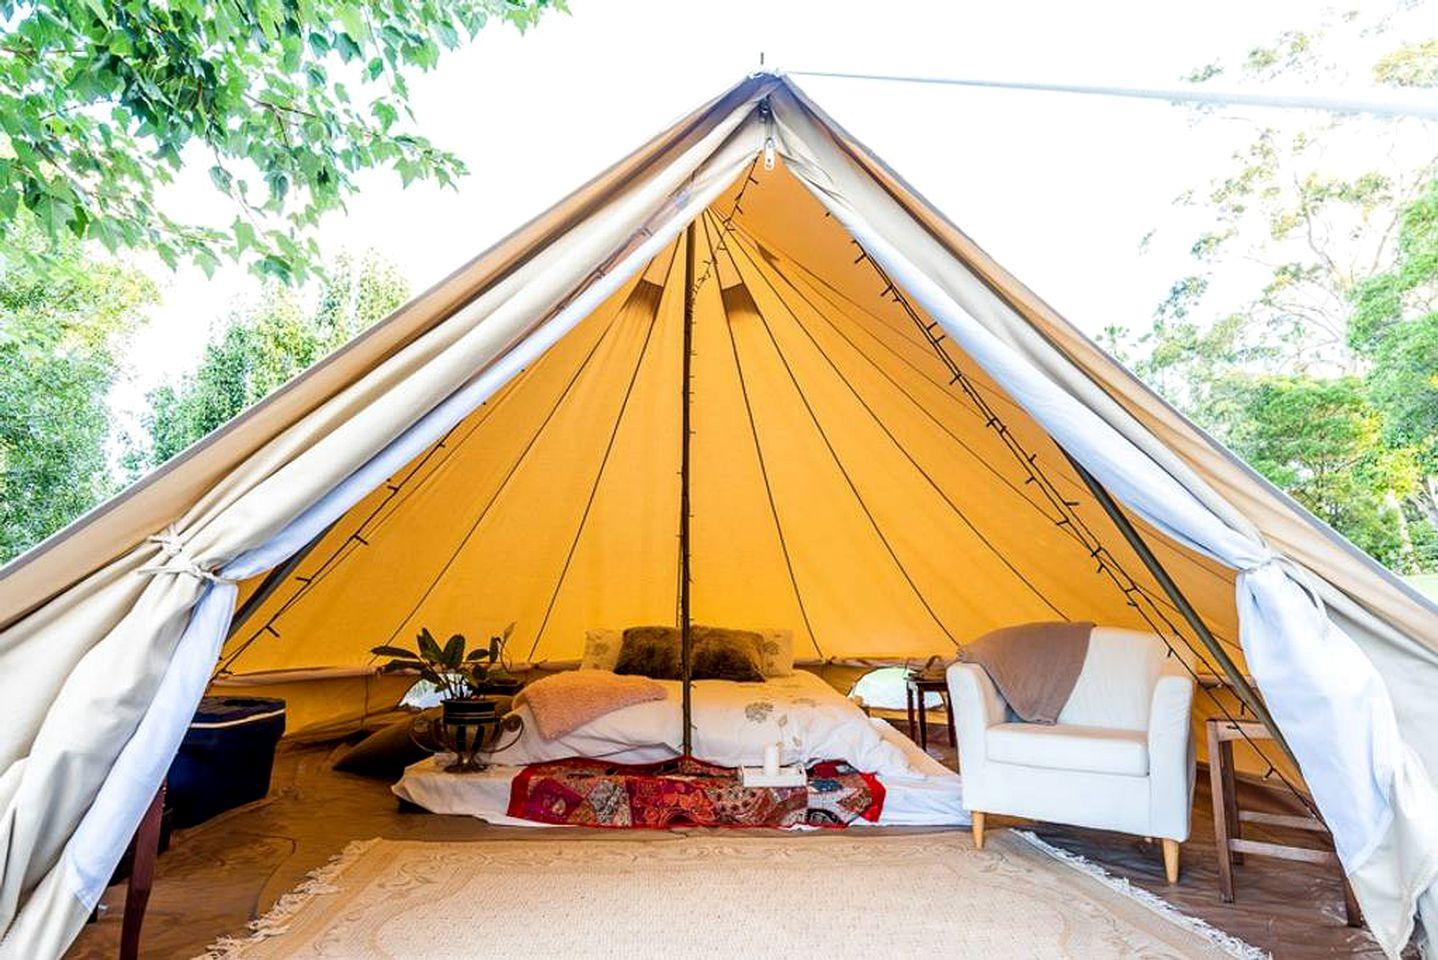 Romantic Camping near Bermagui, New South Wales